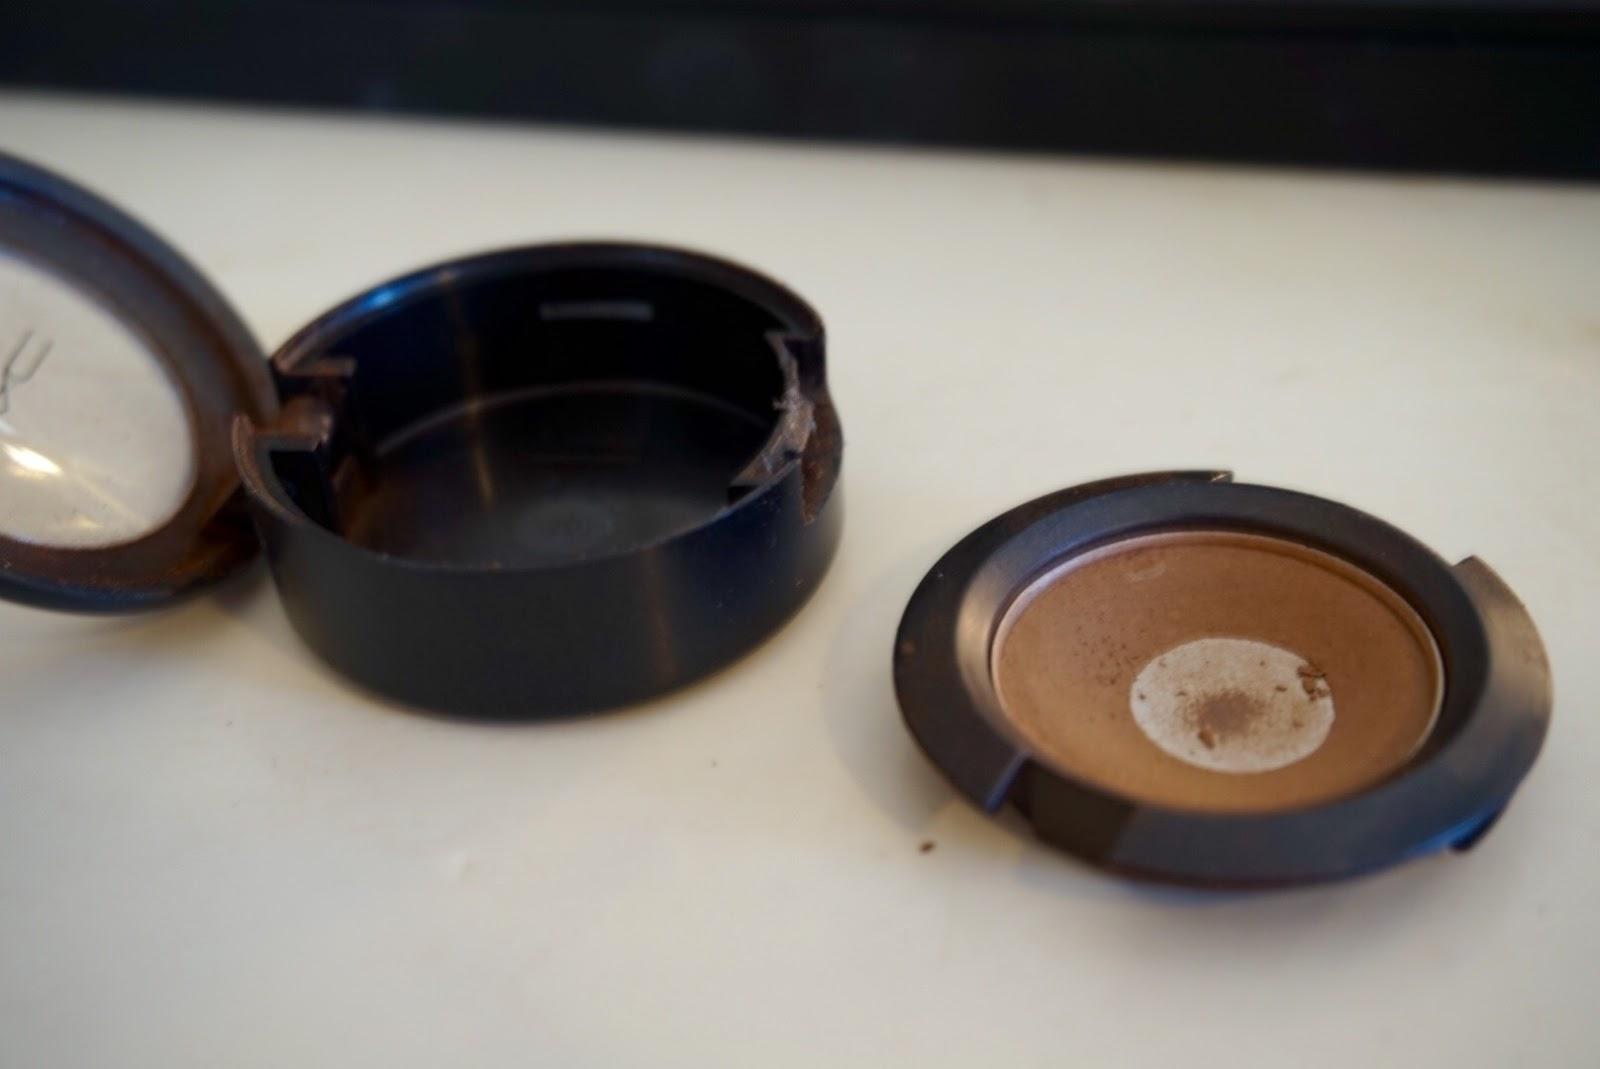 Mac Cork Eyeshadow Depot